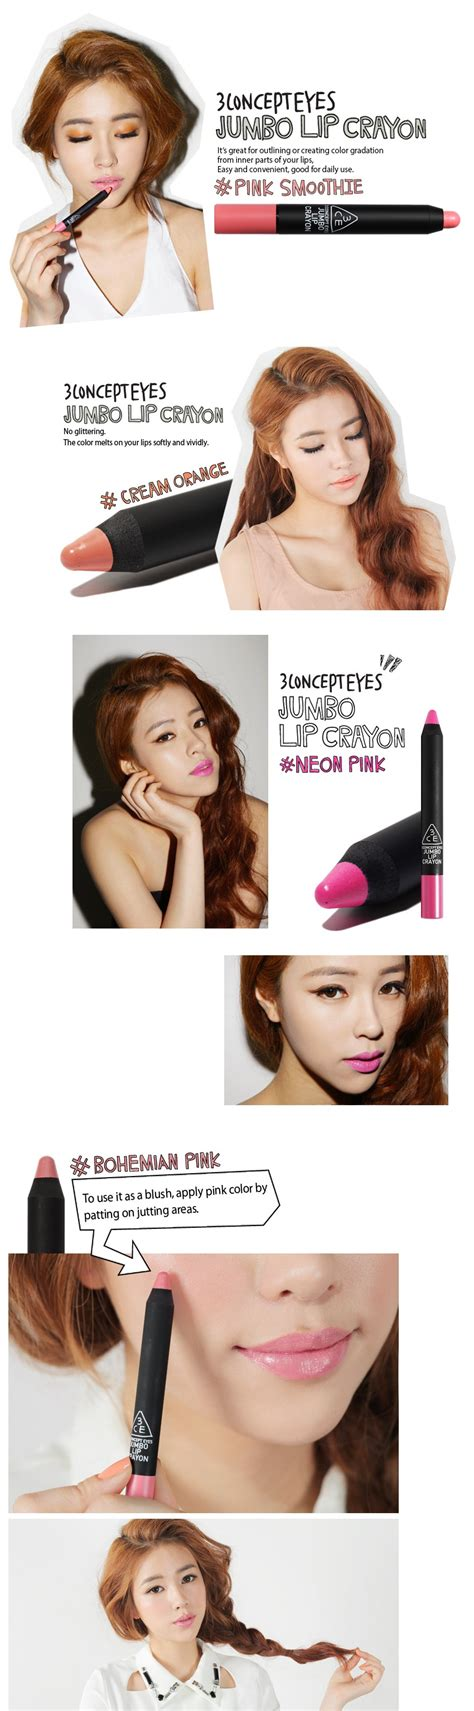 Images Jumbo Lip Crayon Lipstick B031 3ce 3 concept jumbo lip crayon lunatu cosmetics uk